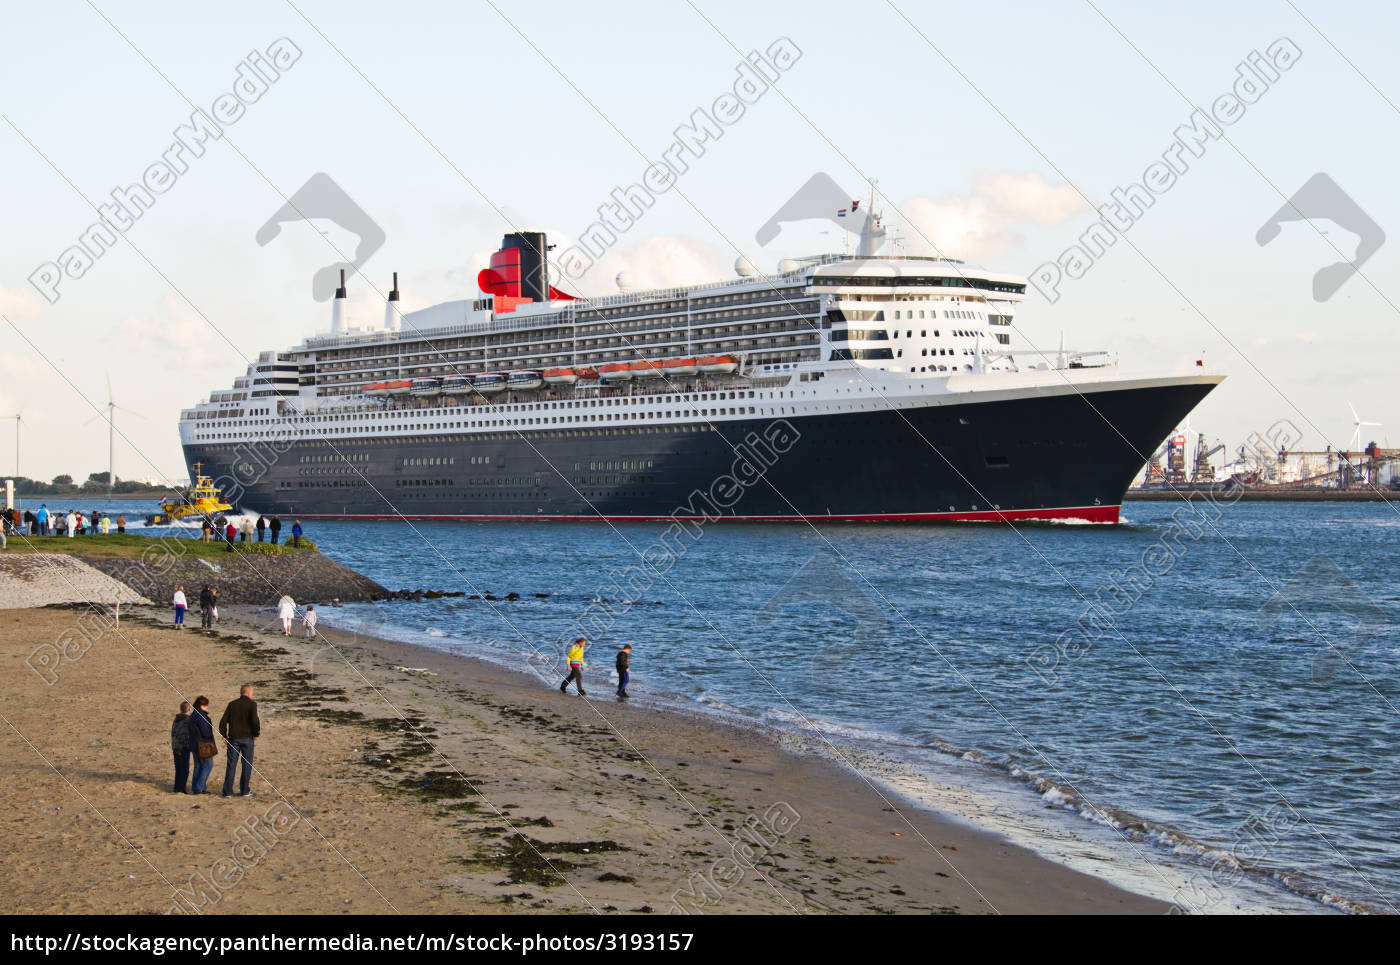 cruise, ship, leaving, port, of, rotterdam - 3193157